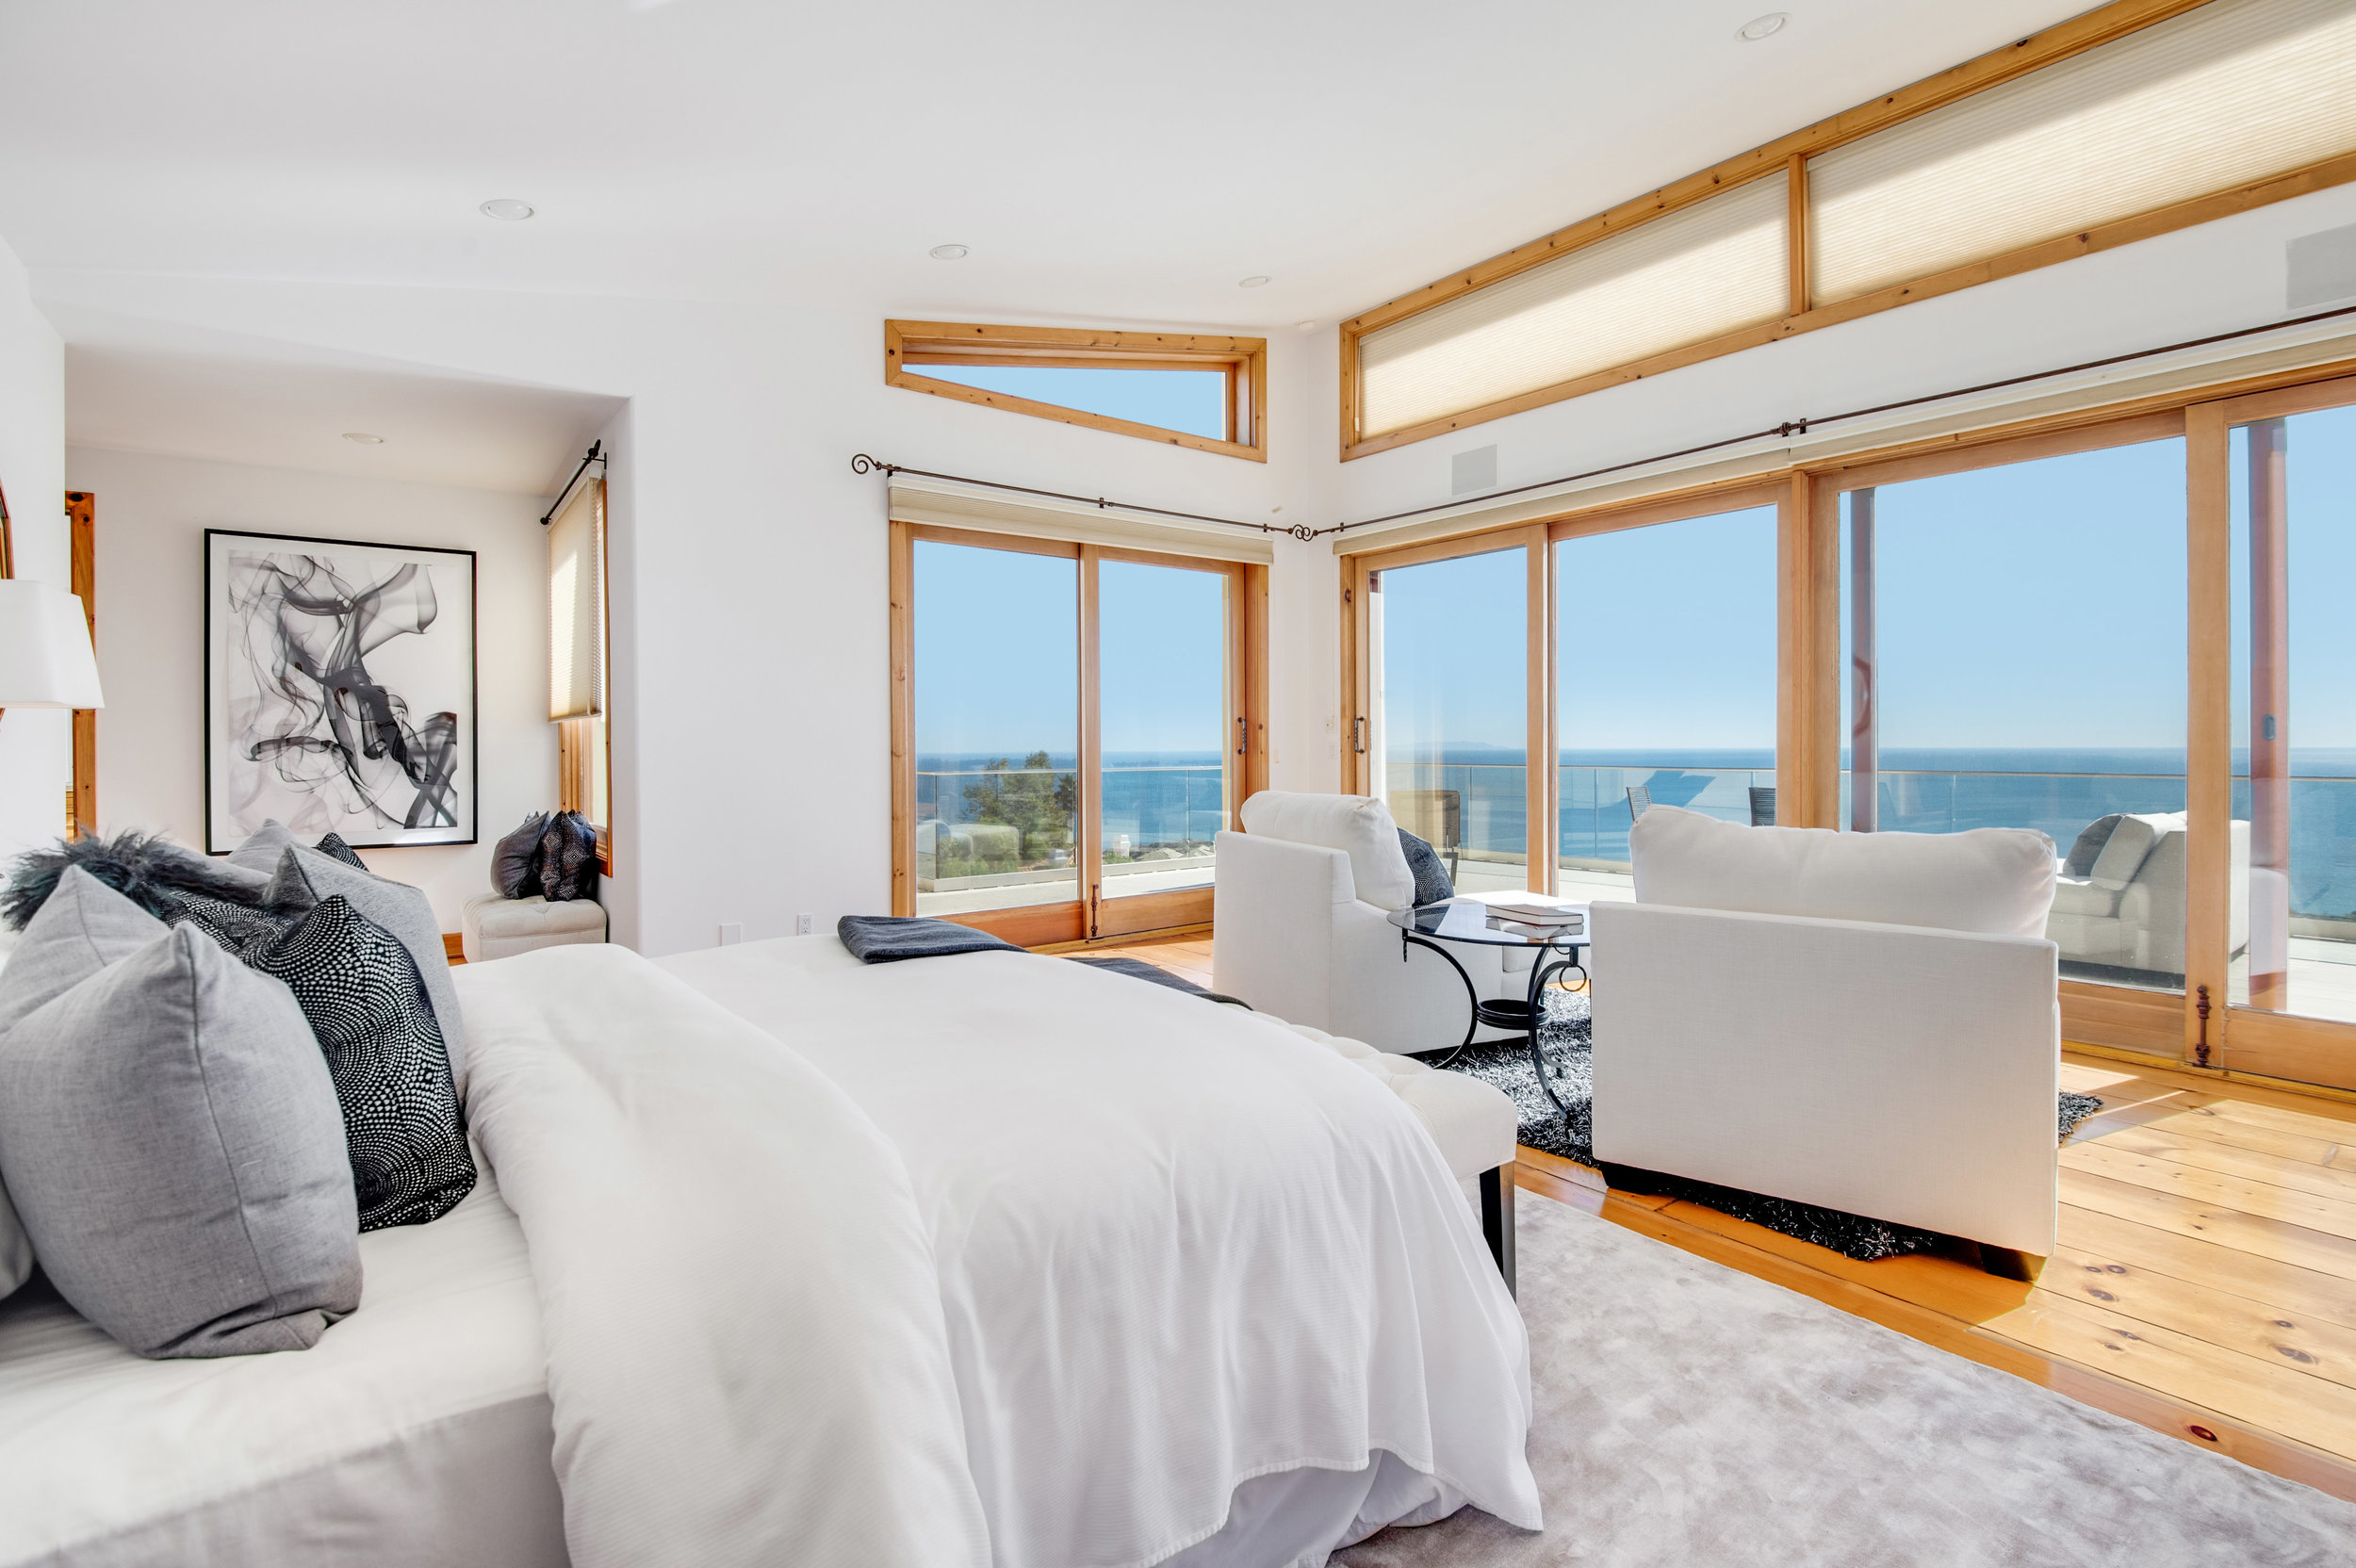 020 Master Bedroom 27475 Latigo Bay View Drive For Sale Lease The Malibu Life Team Luxury Real Estate.jpg